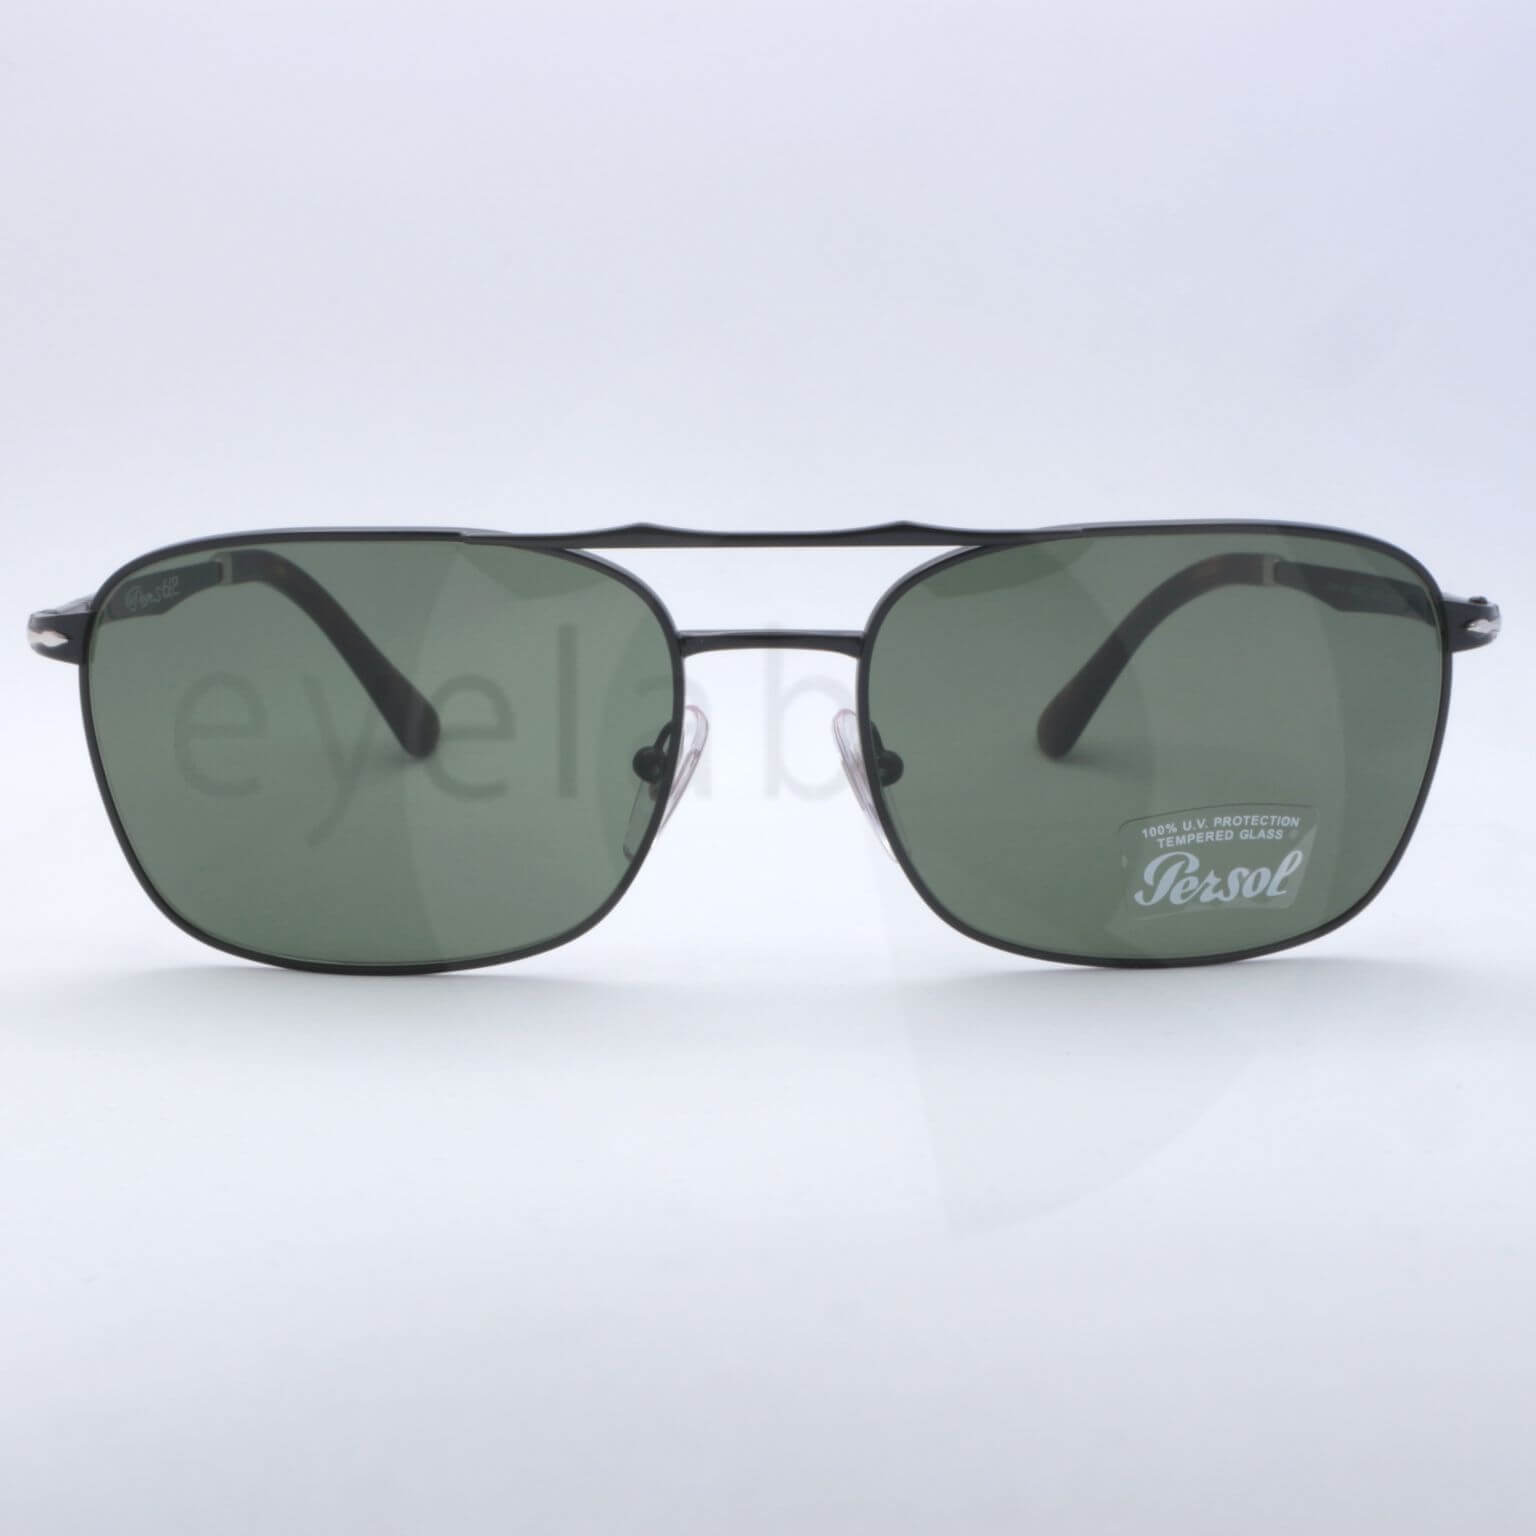 dbcf18458c Γυαλιά ηλίου Persol 2454S 107831 ~ Eyelab